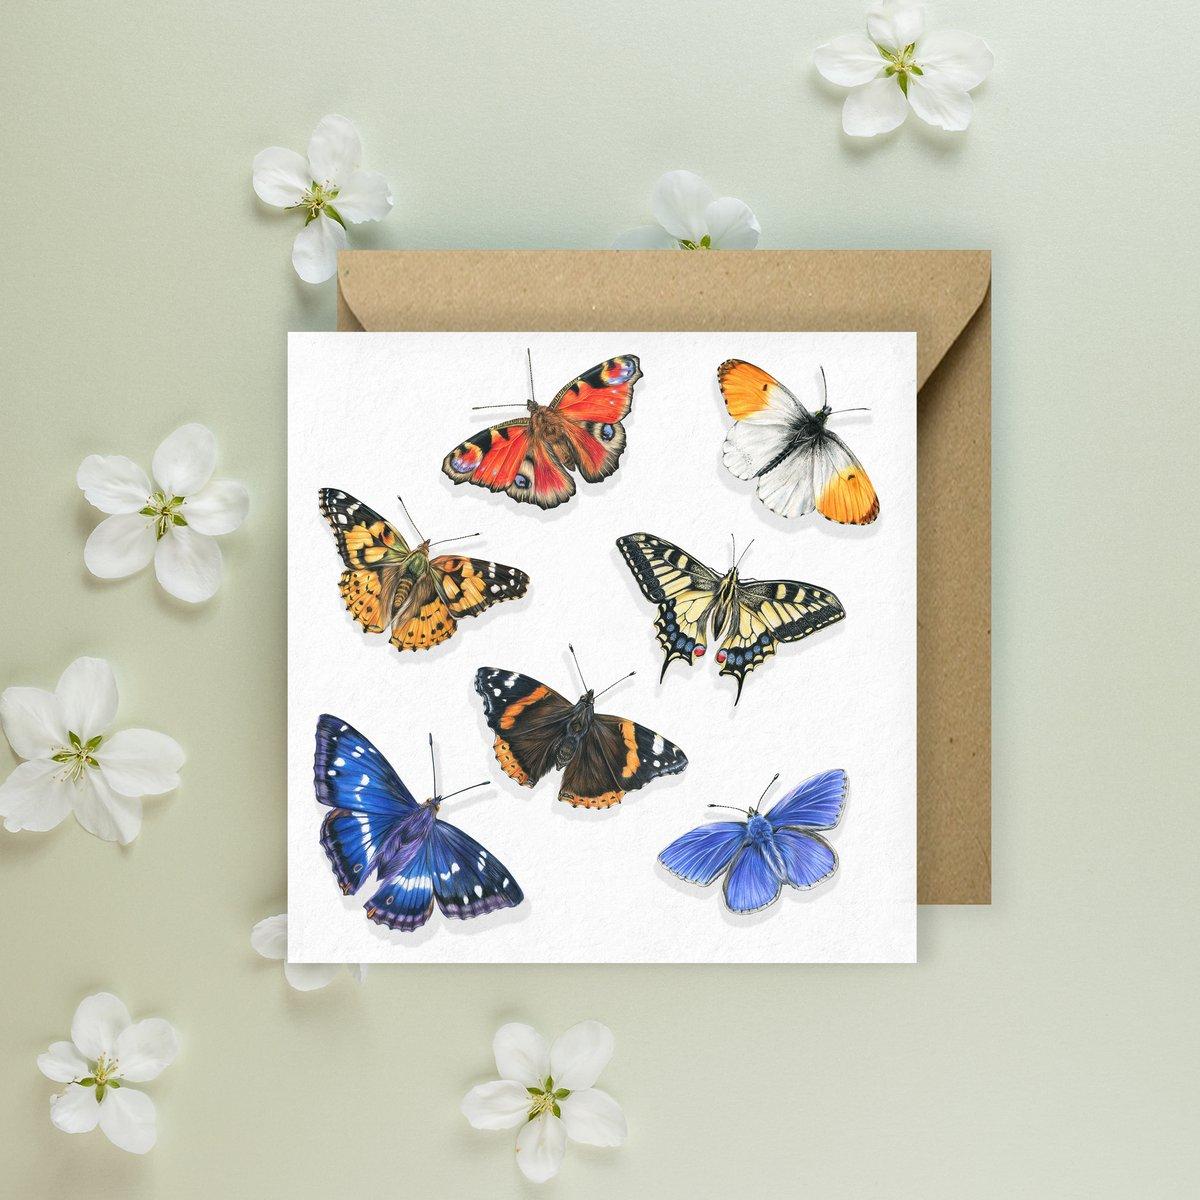 Image of 'Butterflies' Greeeting Card